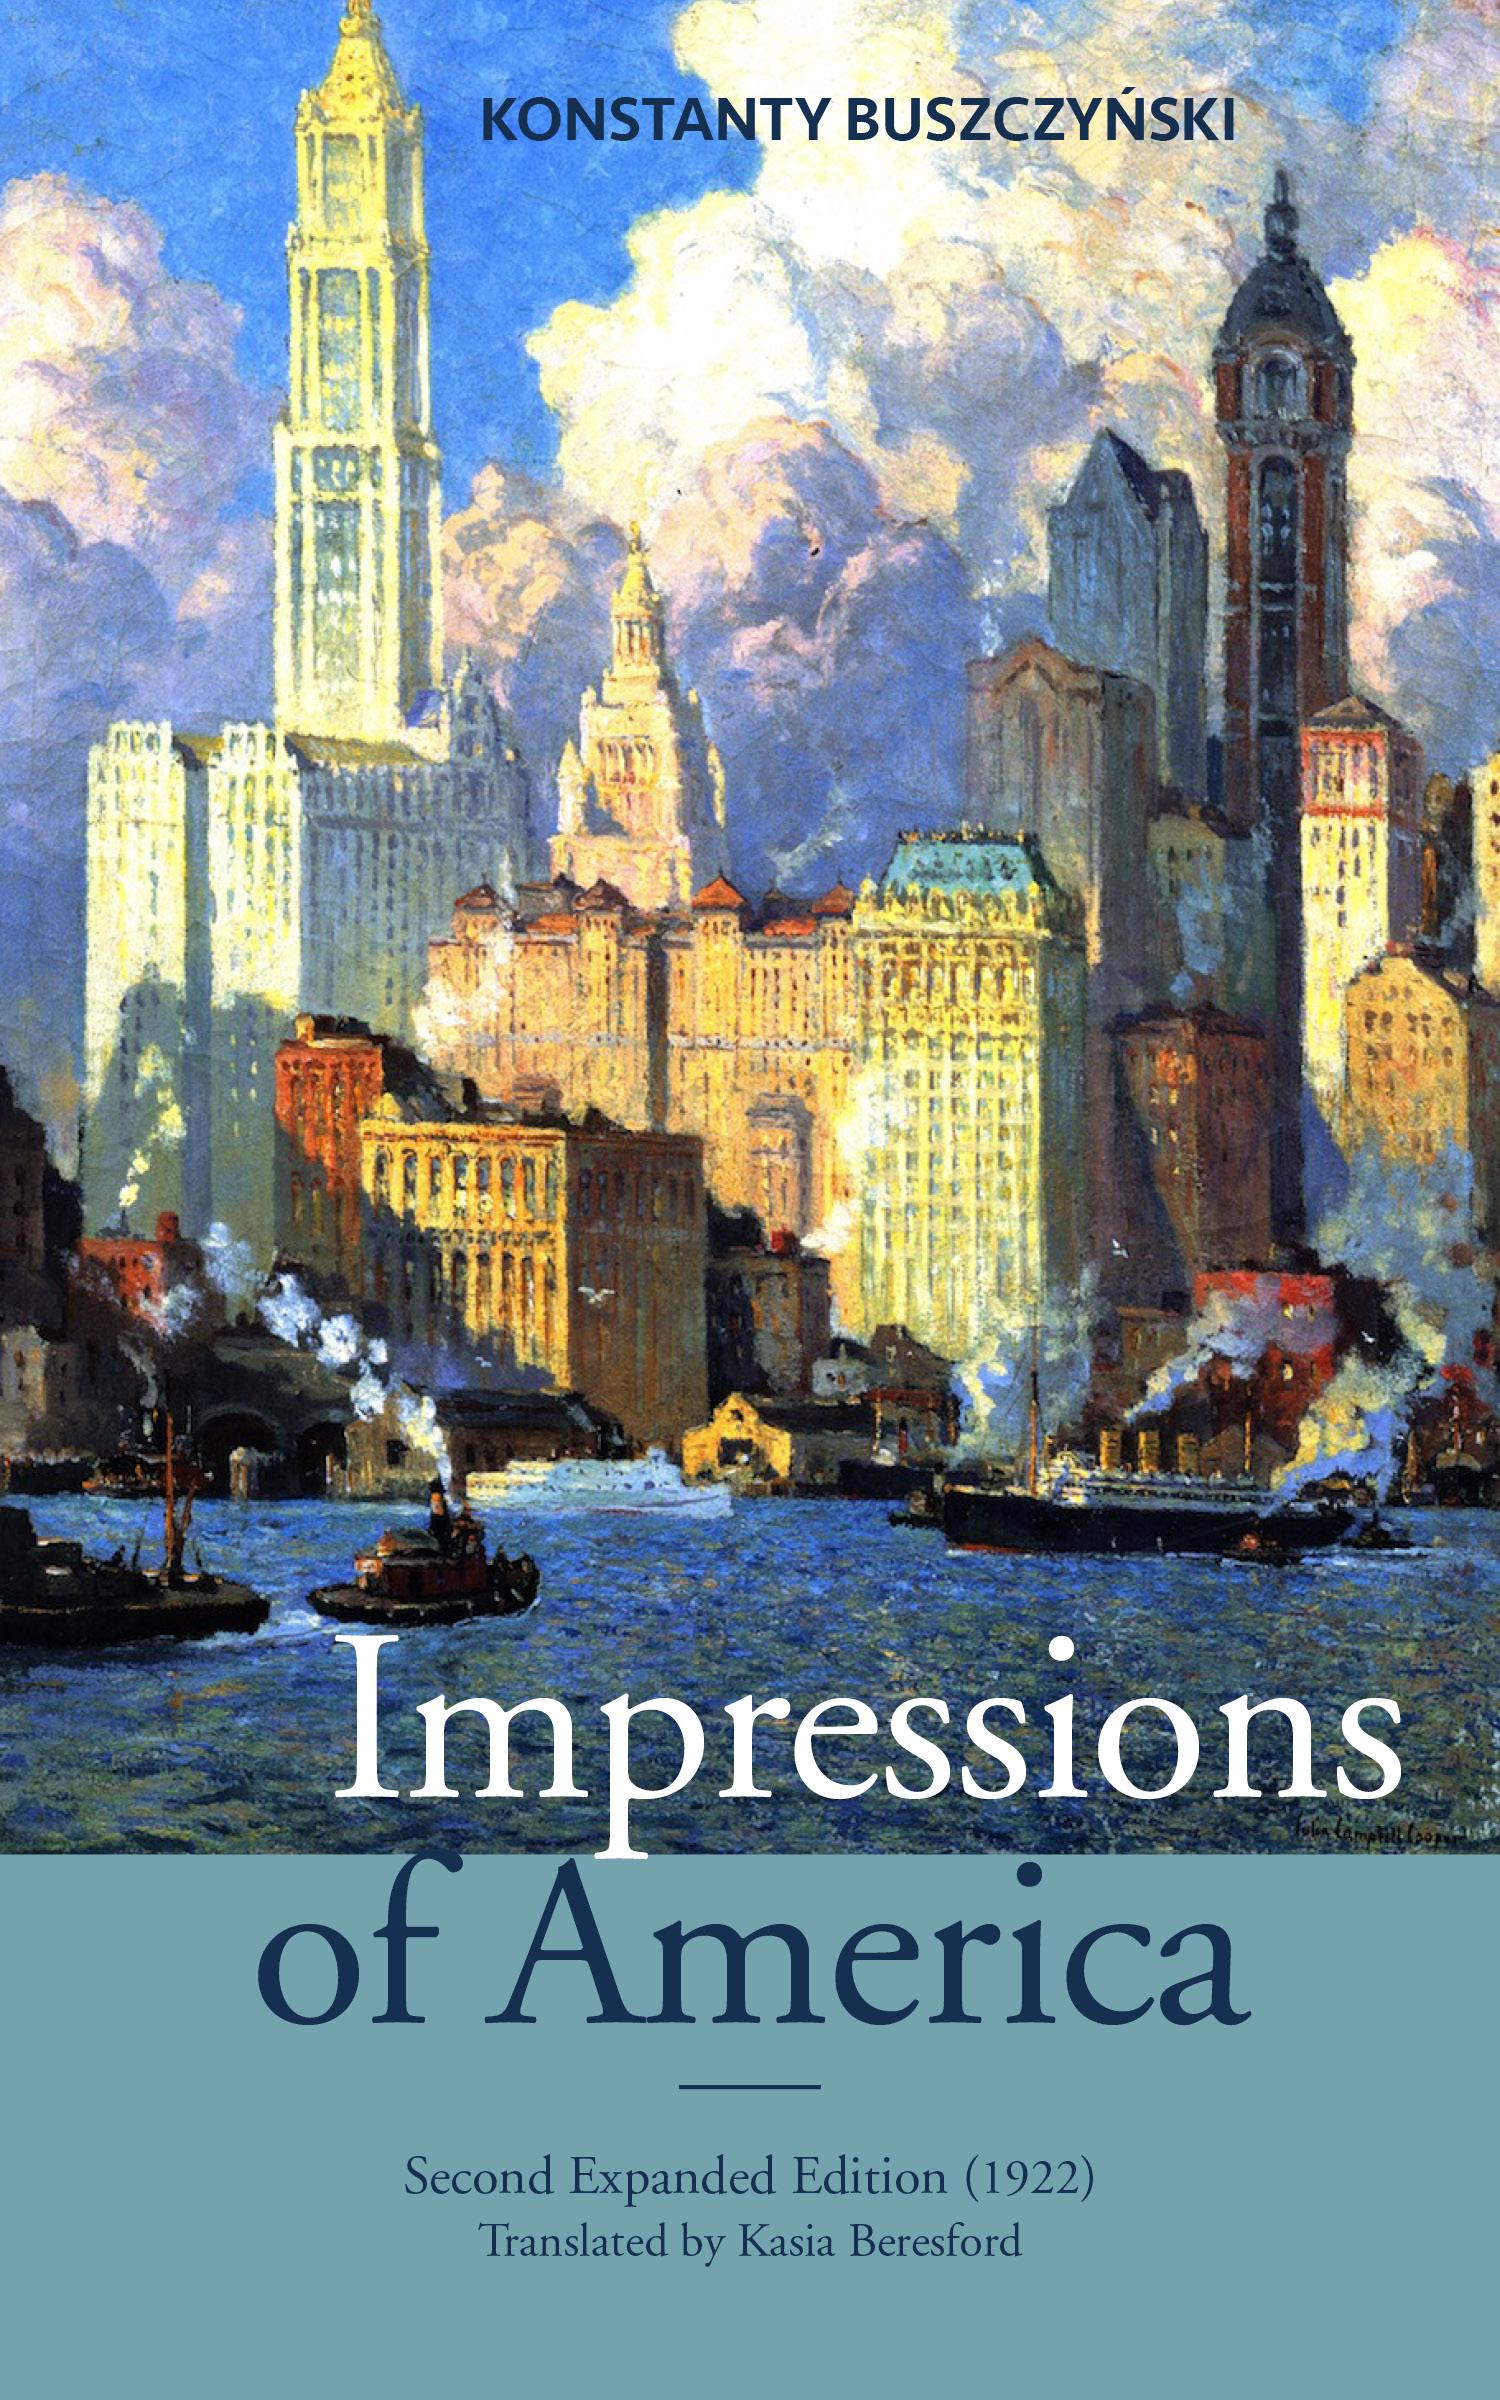 Impressions_of_America.jpg